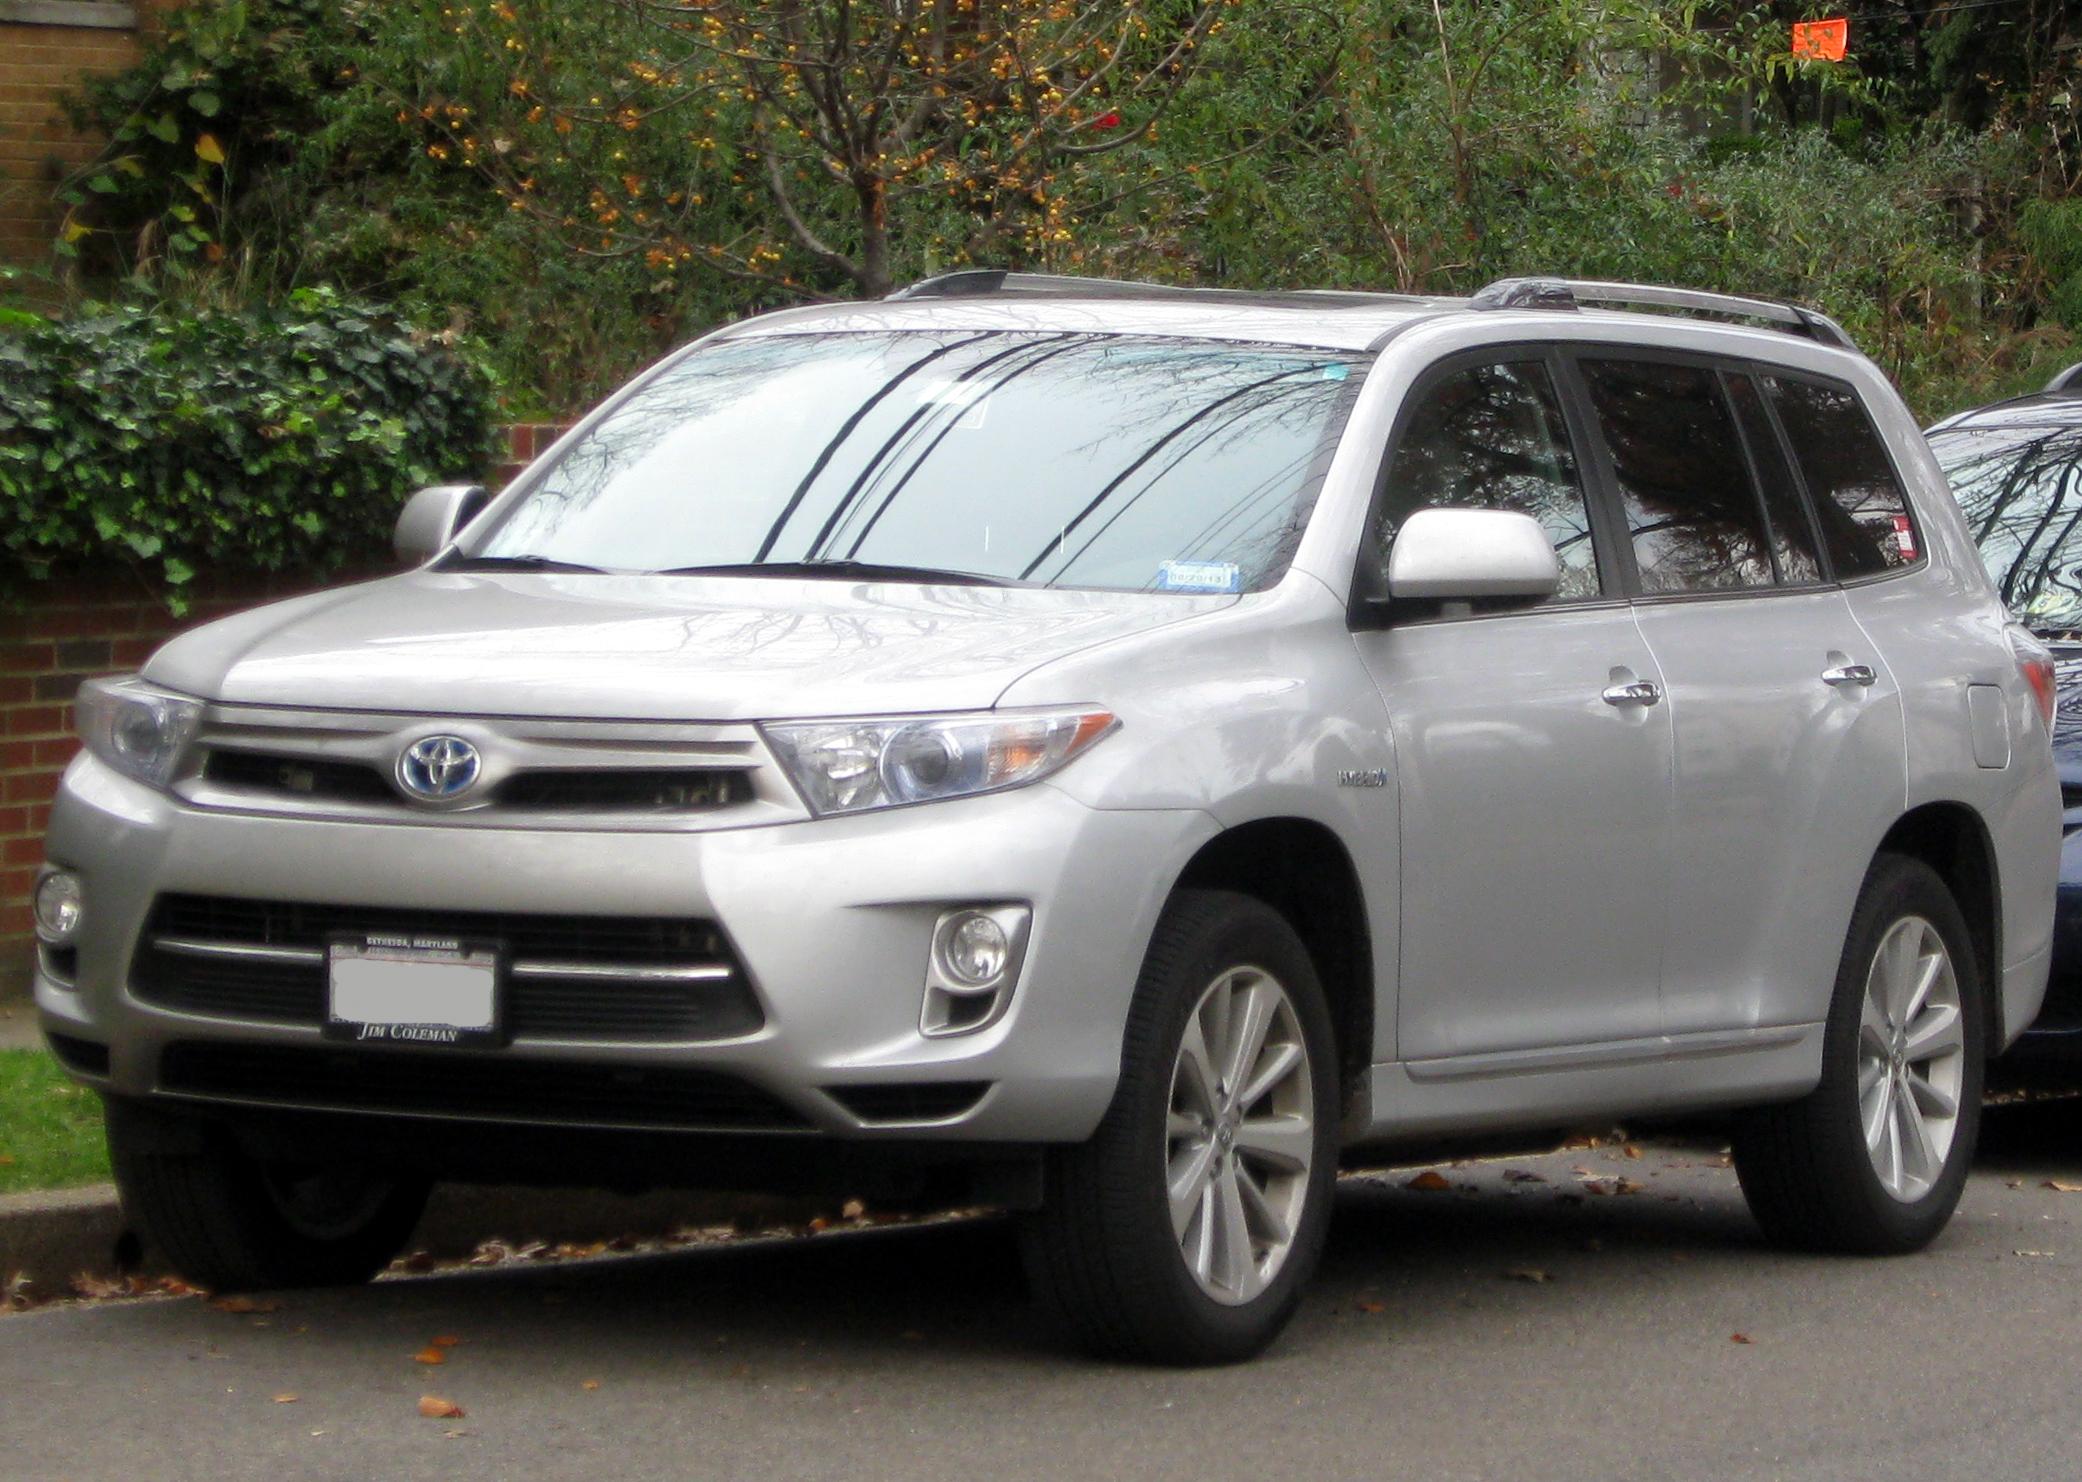 Nice File:2011 Toyota Highlander Hybrid Limited    11 20 2011 1.